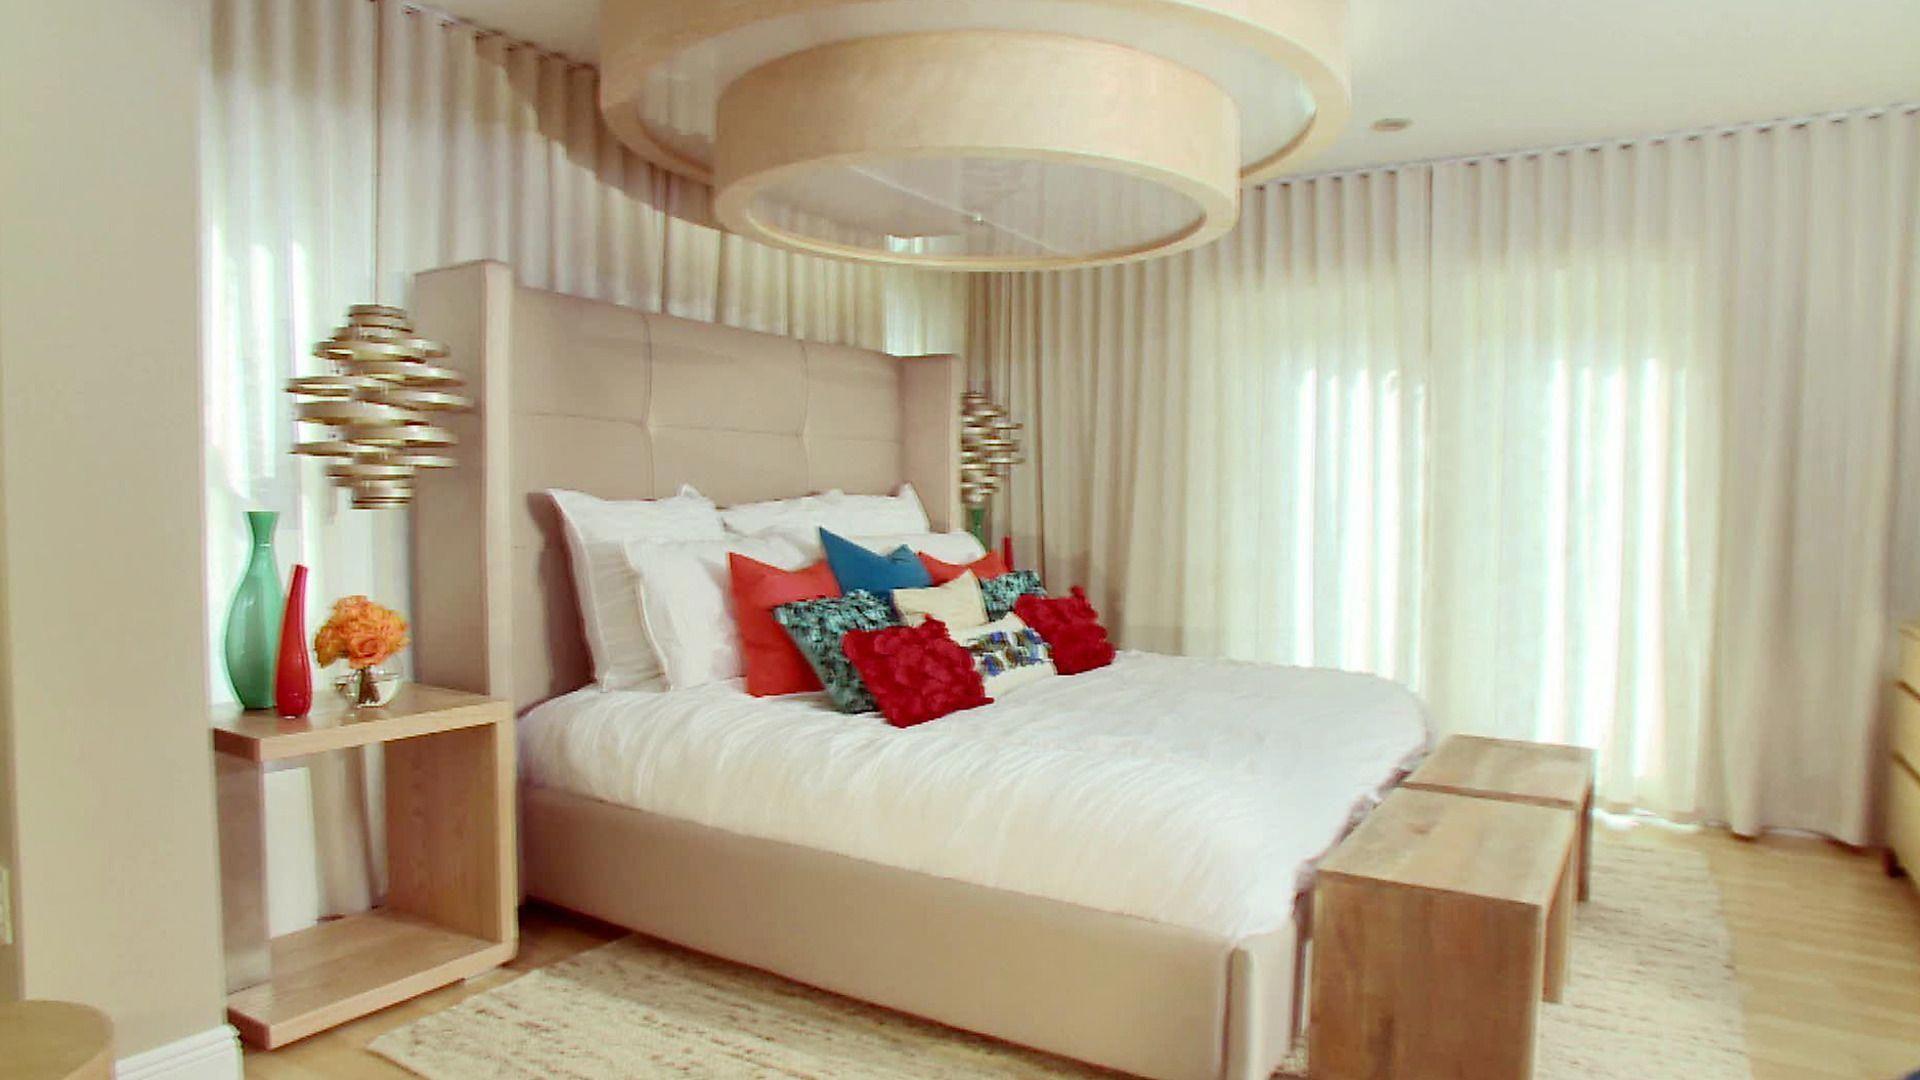 Small Bedroom Ideas For Men Small Bedroom Ideas Smallbedroom Ideas Tags Bedroom Small Bedroom Colours Master Bedroom Colors Bedroom Color Schemes New hgtv small bedrooms